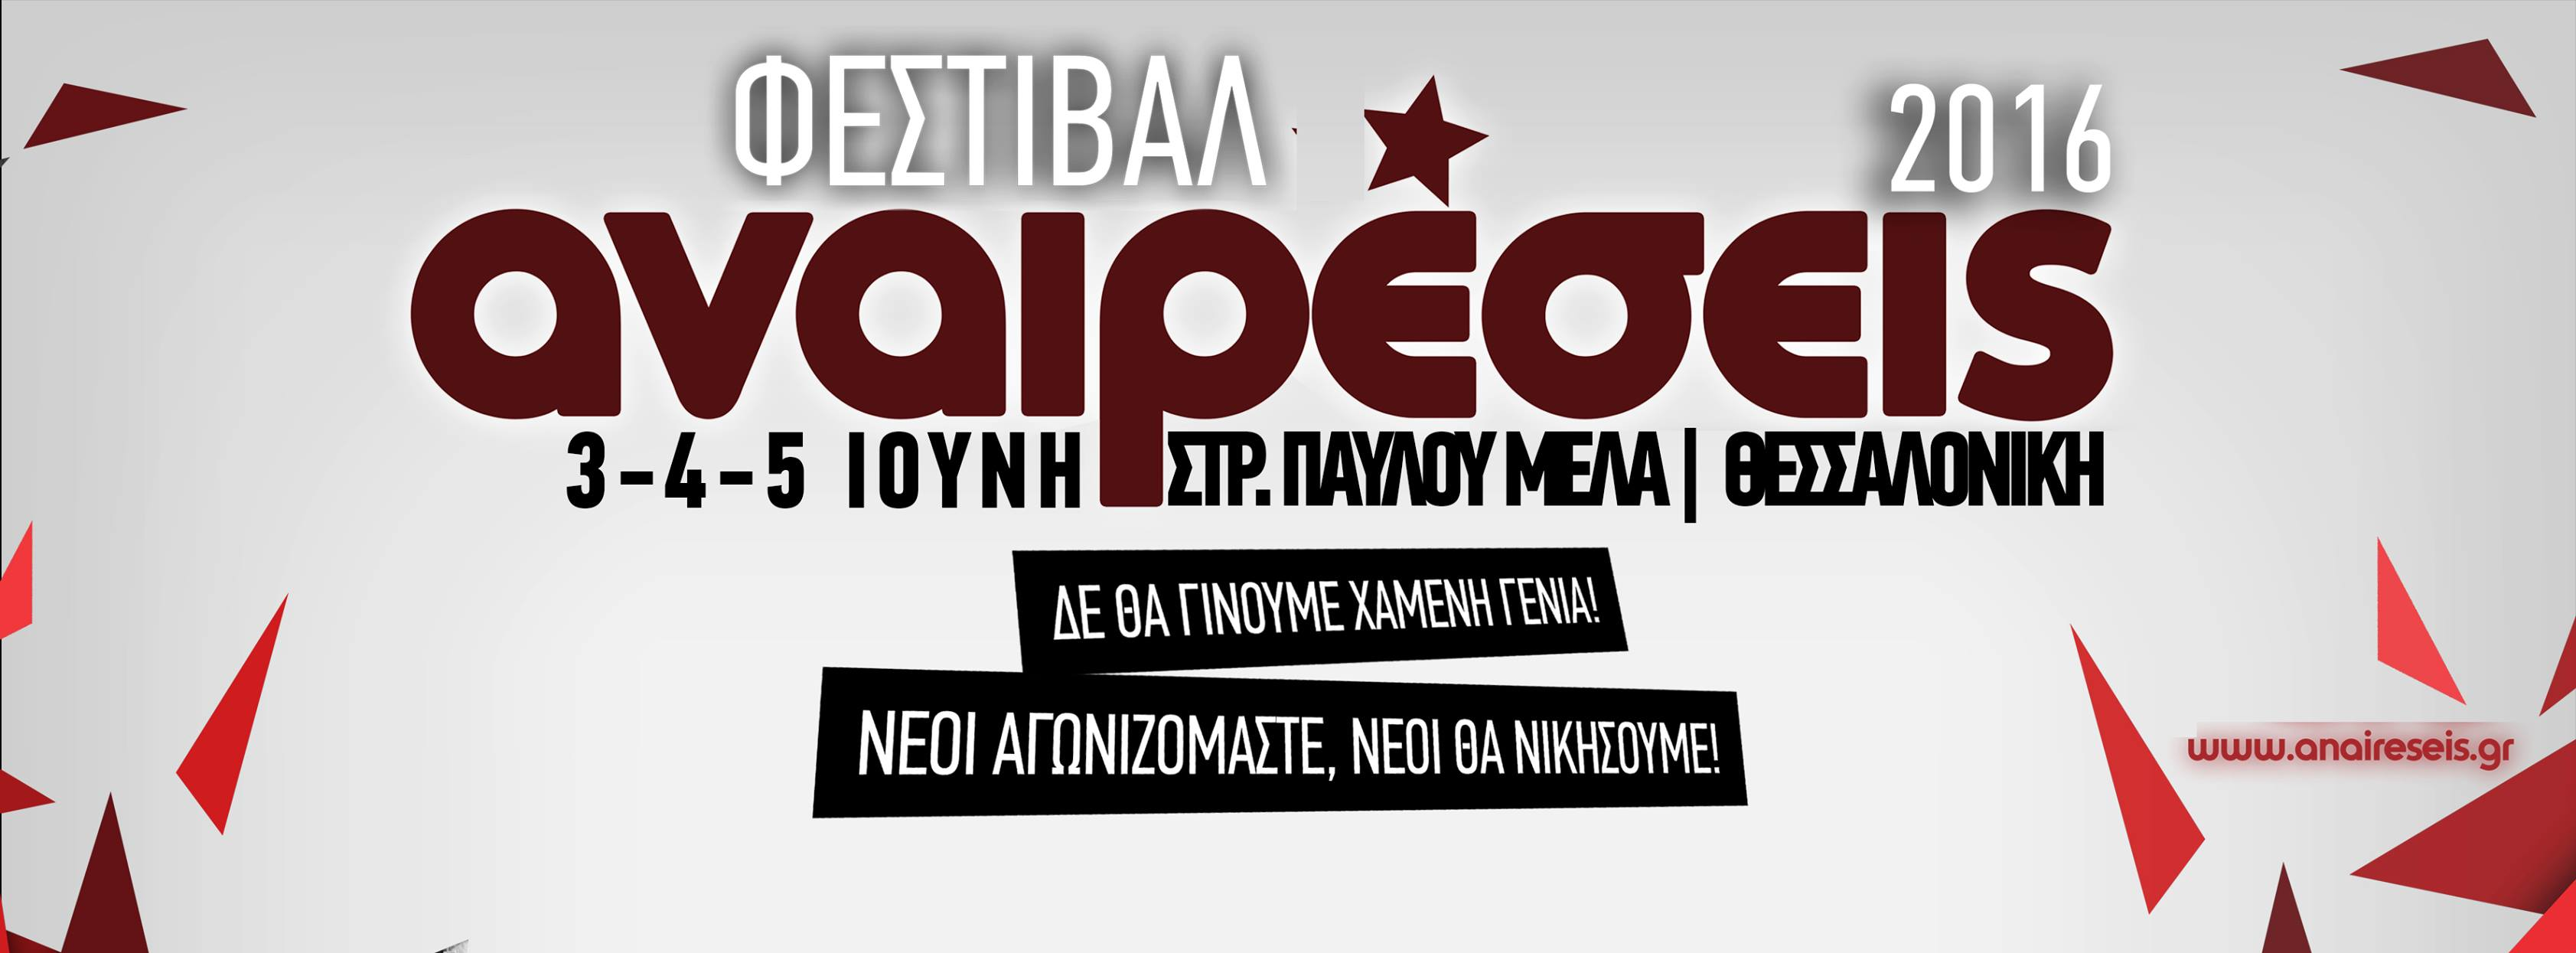 https://i2.wp.com/www.anaireseis.gr/wp-content/uploads/2016/05/Salonika2016banner.jpg